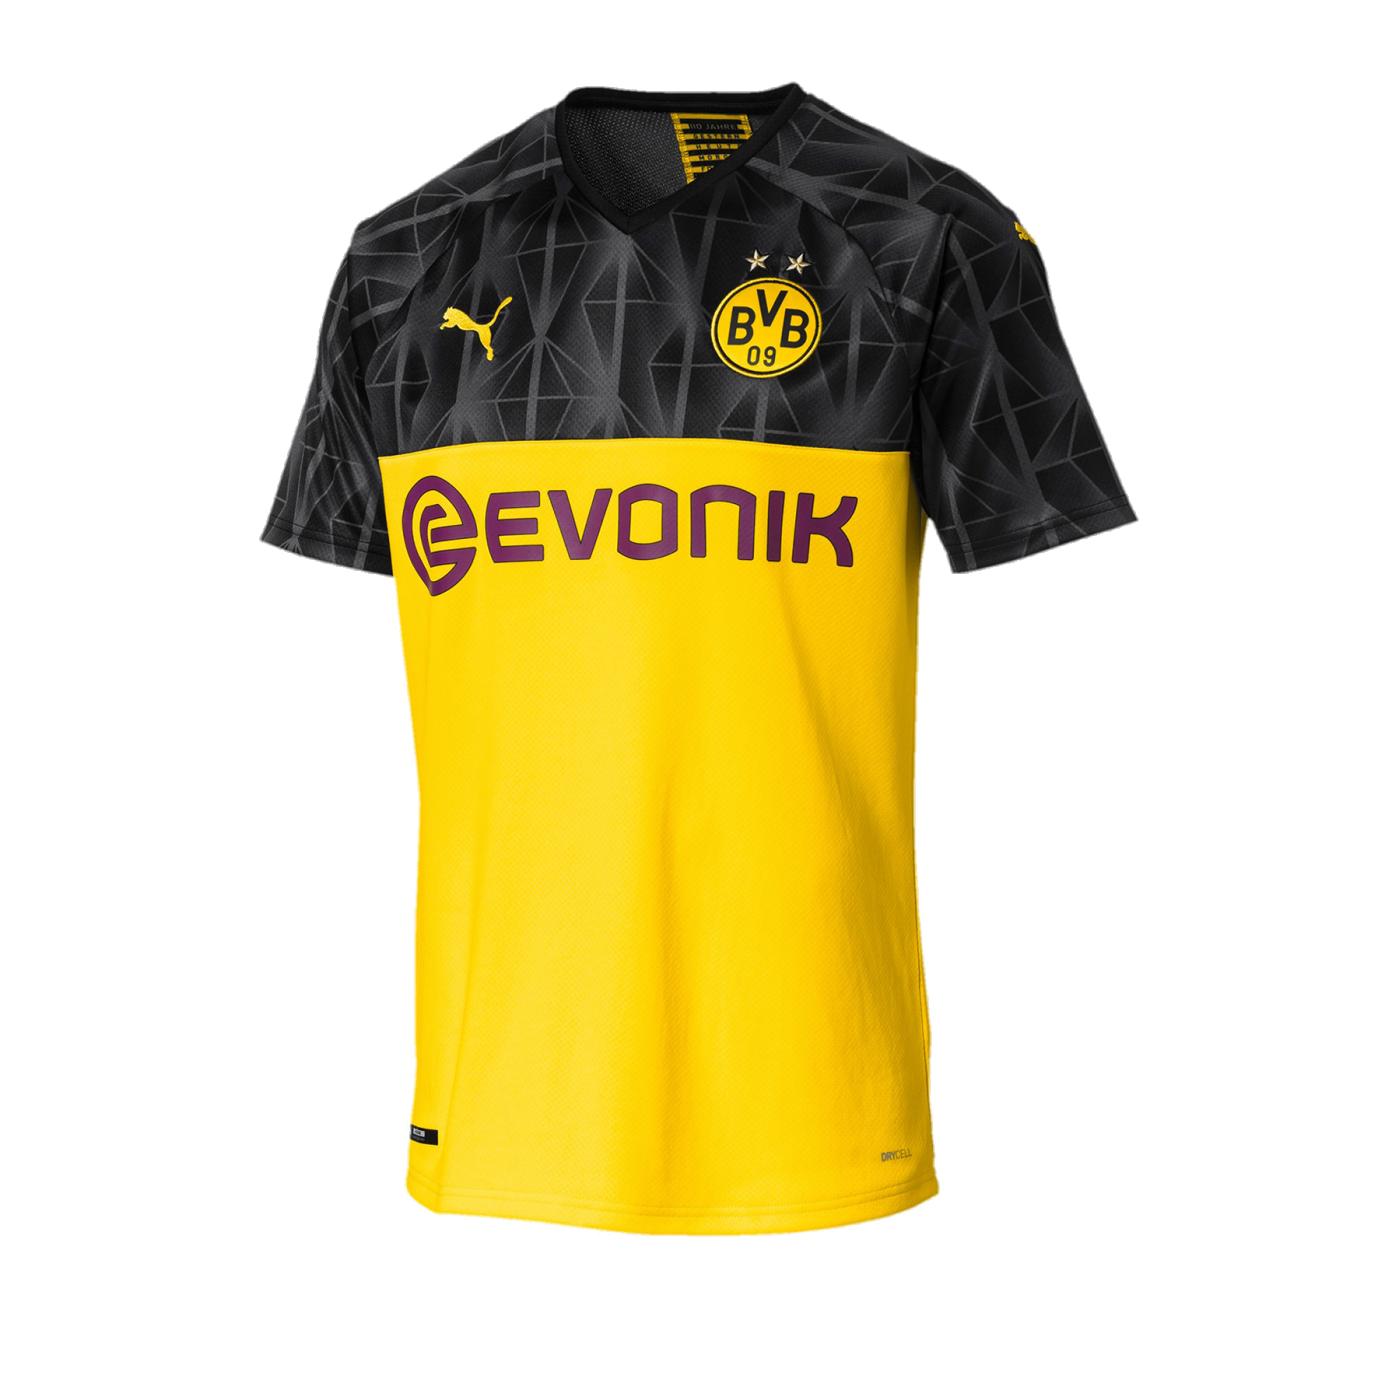 PUMA BVB Dortmund Trikot UCL 20192020 Gelb F11